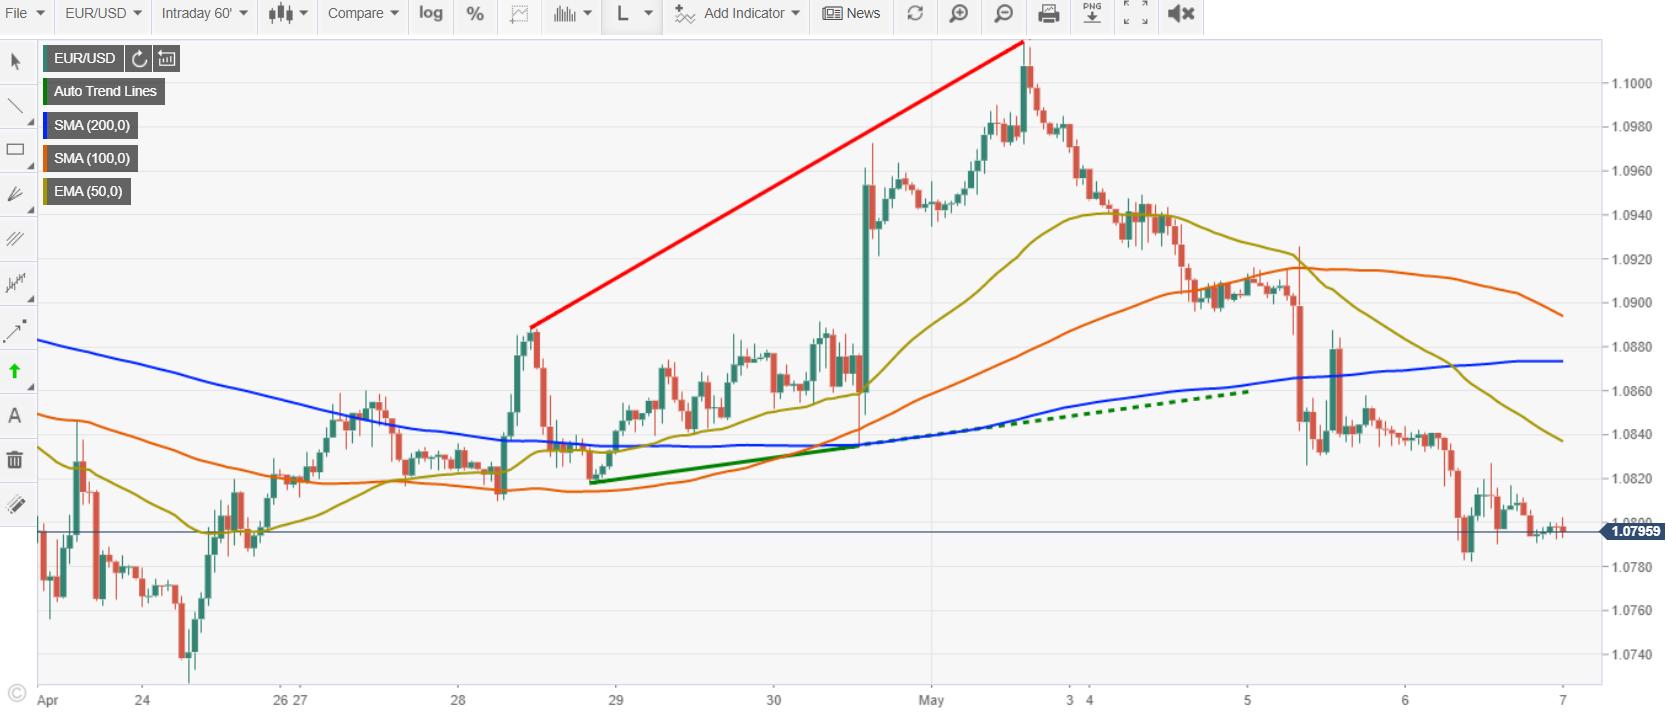 FXStreet EURUSD 60 M Chart - 07 May 2020